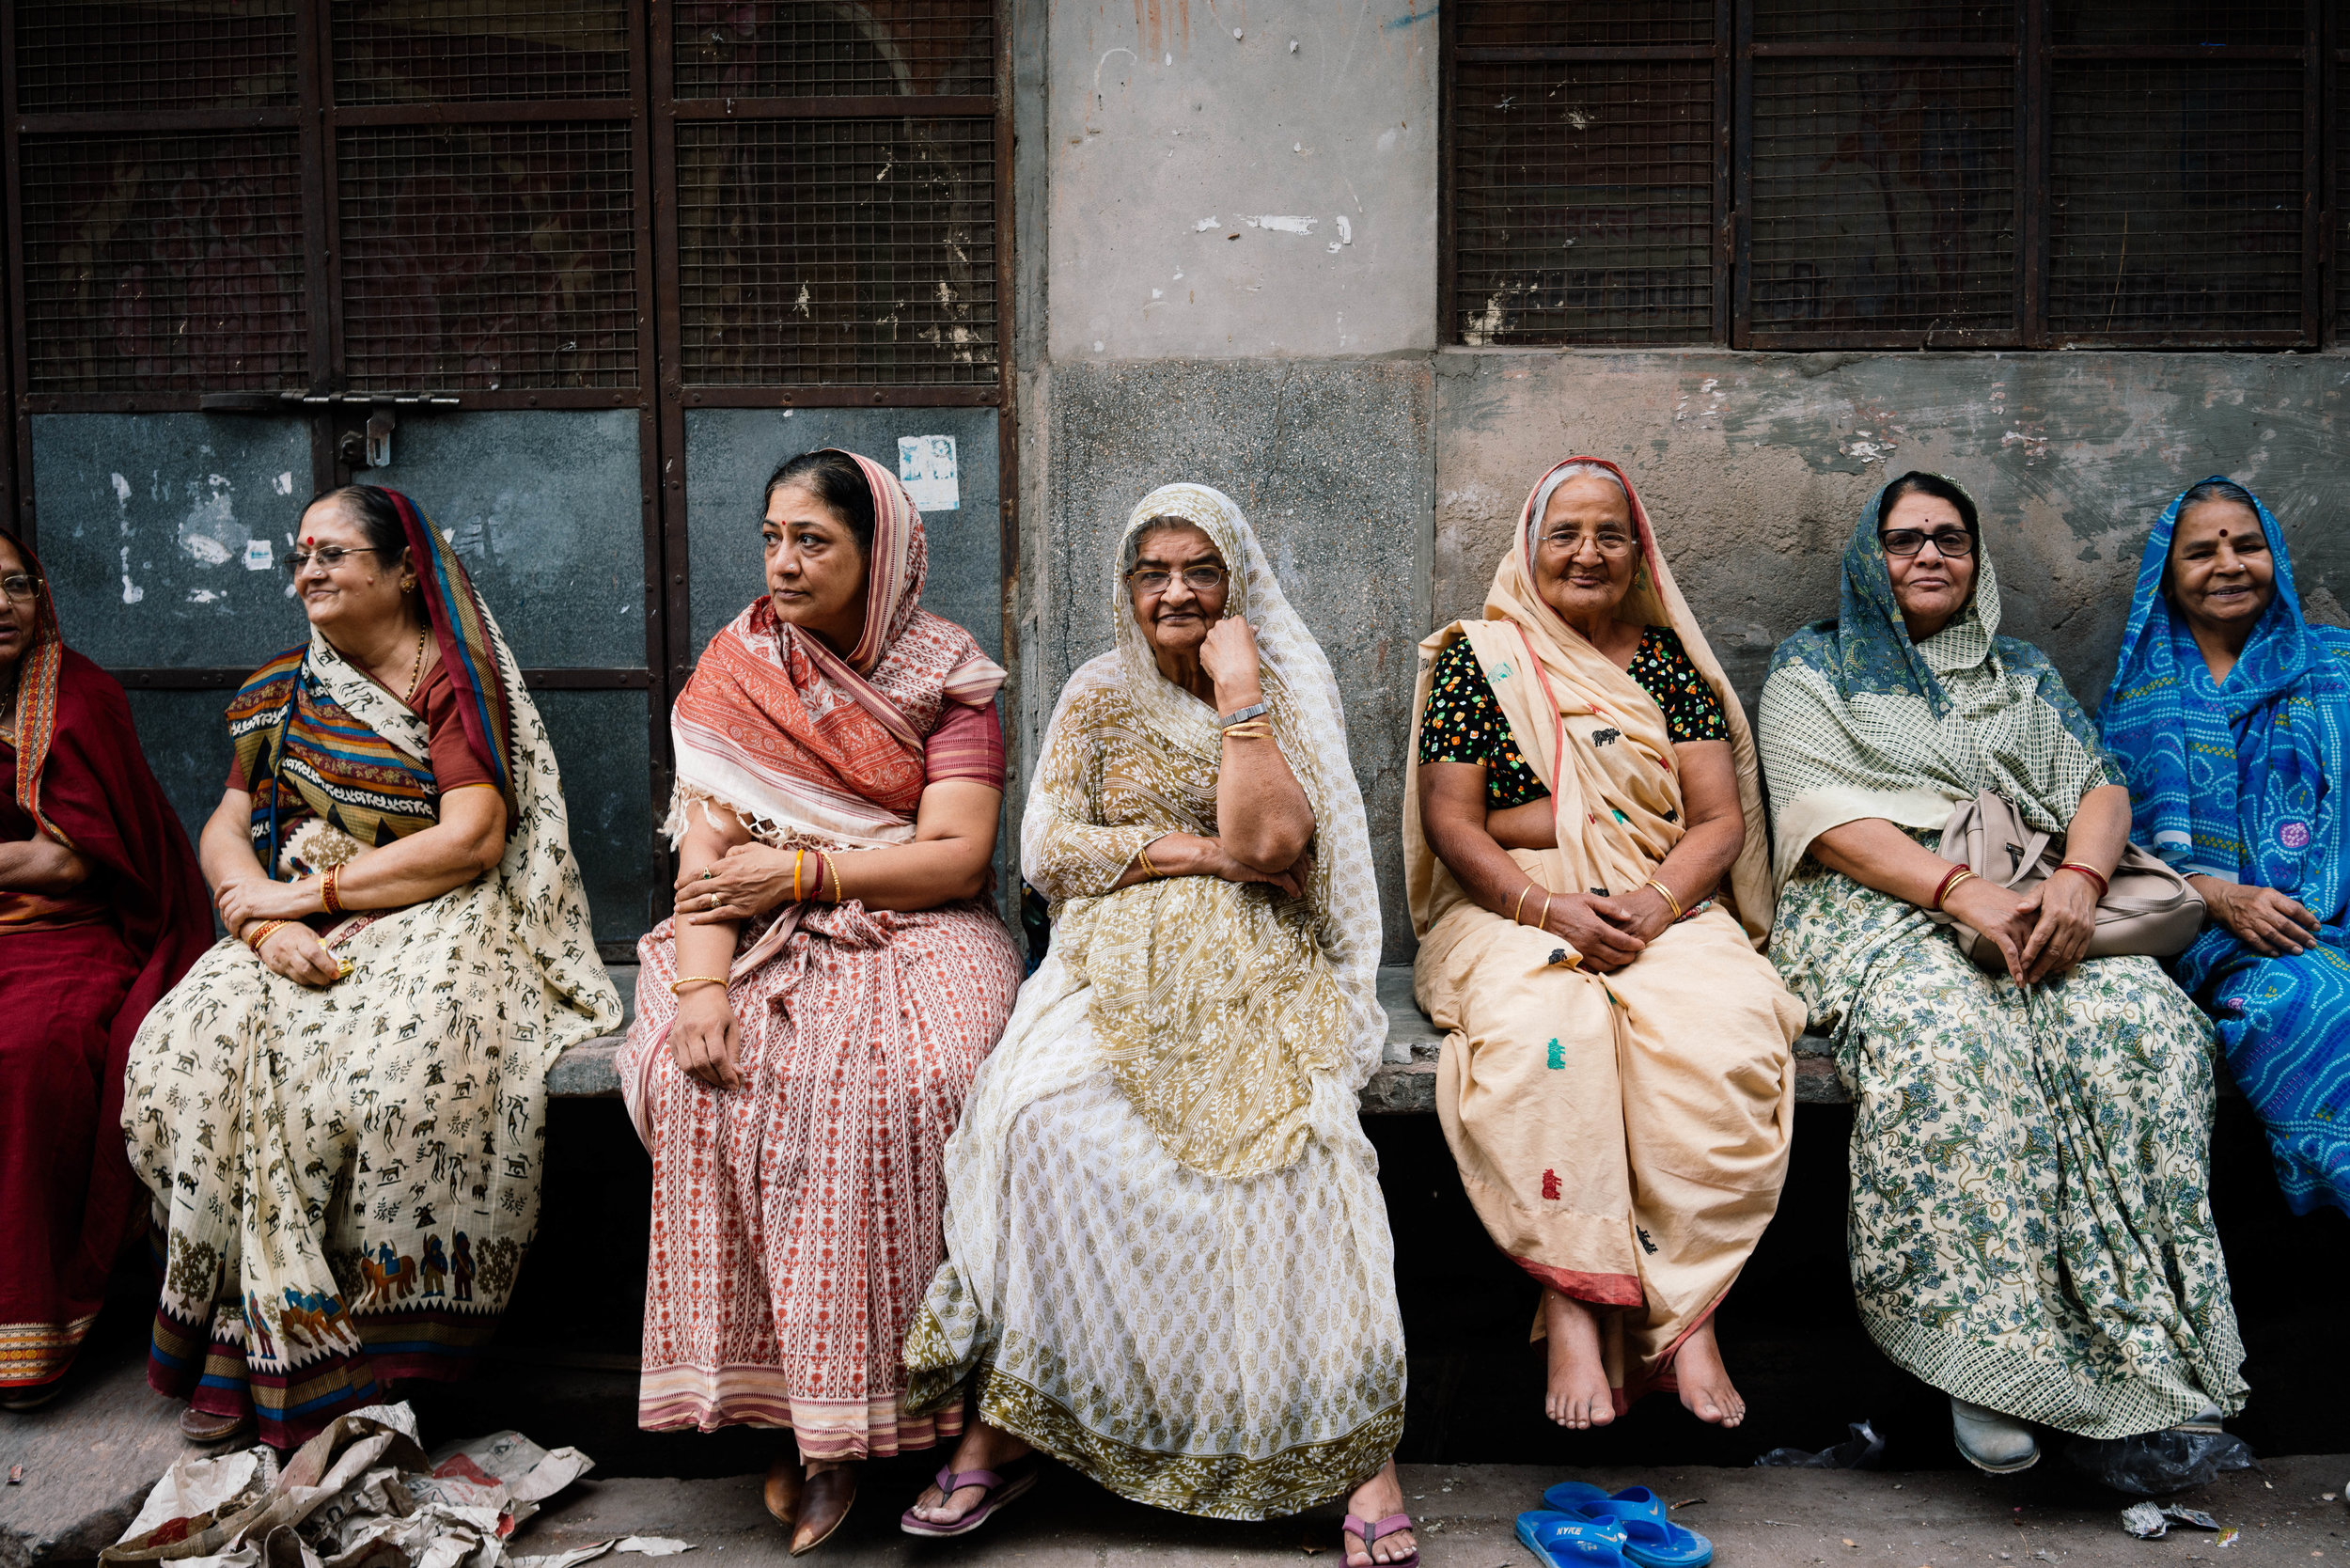 india-08372.jpg